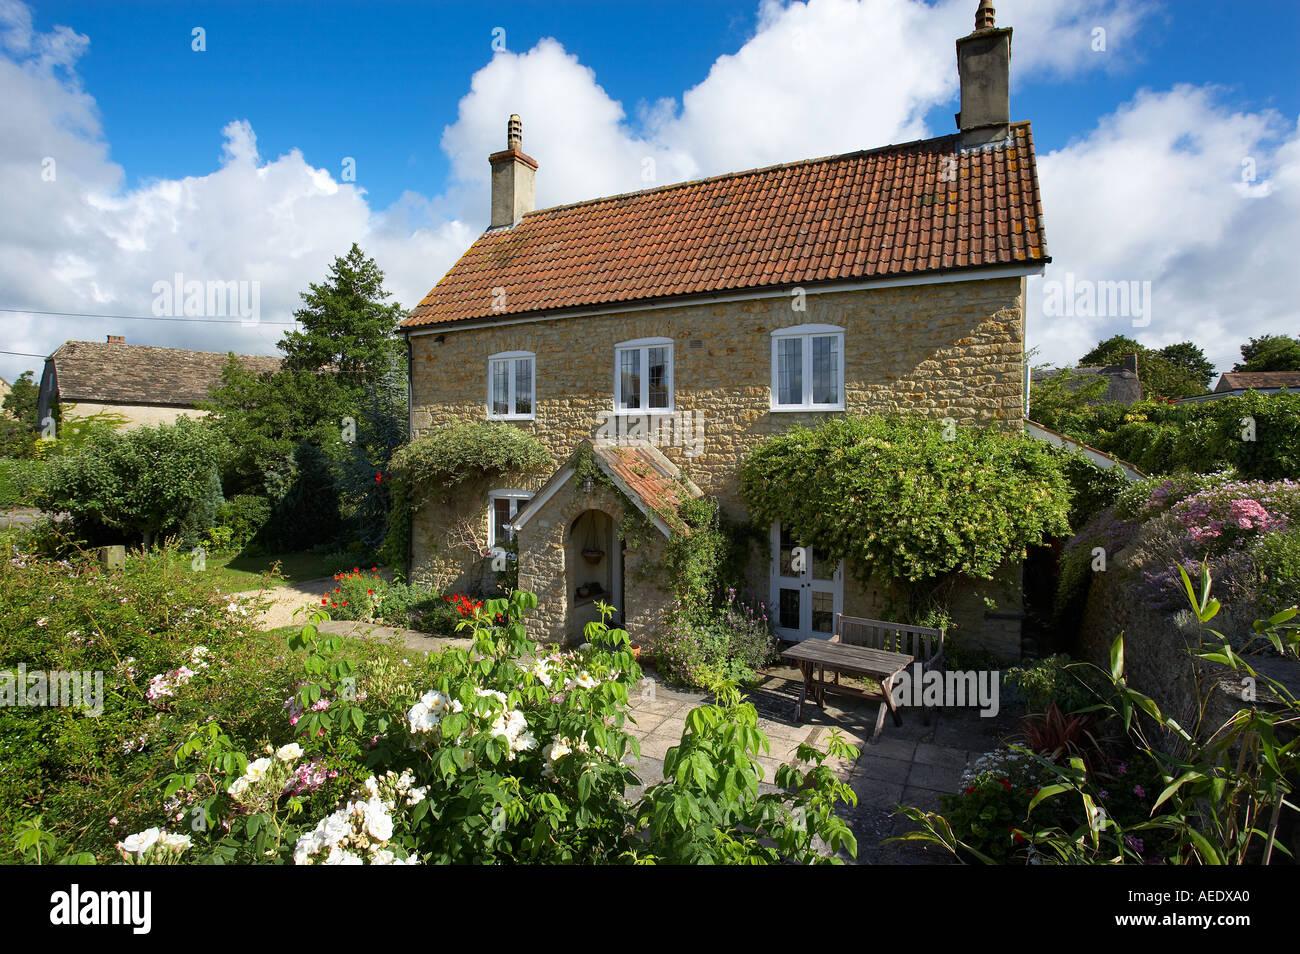 Plum Tree Cottage an English cottage property released Milborne Port Sherborne Dorset England UK - Stock Image